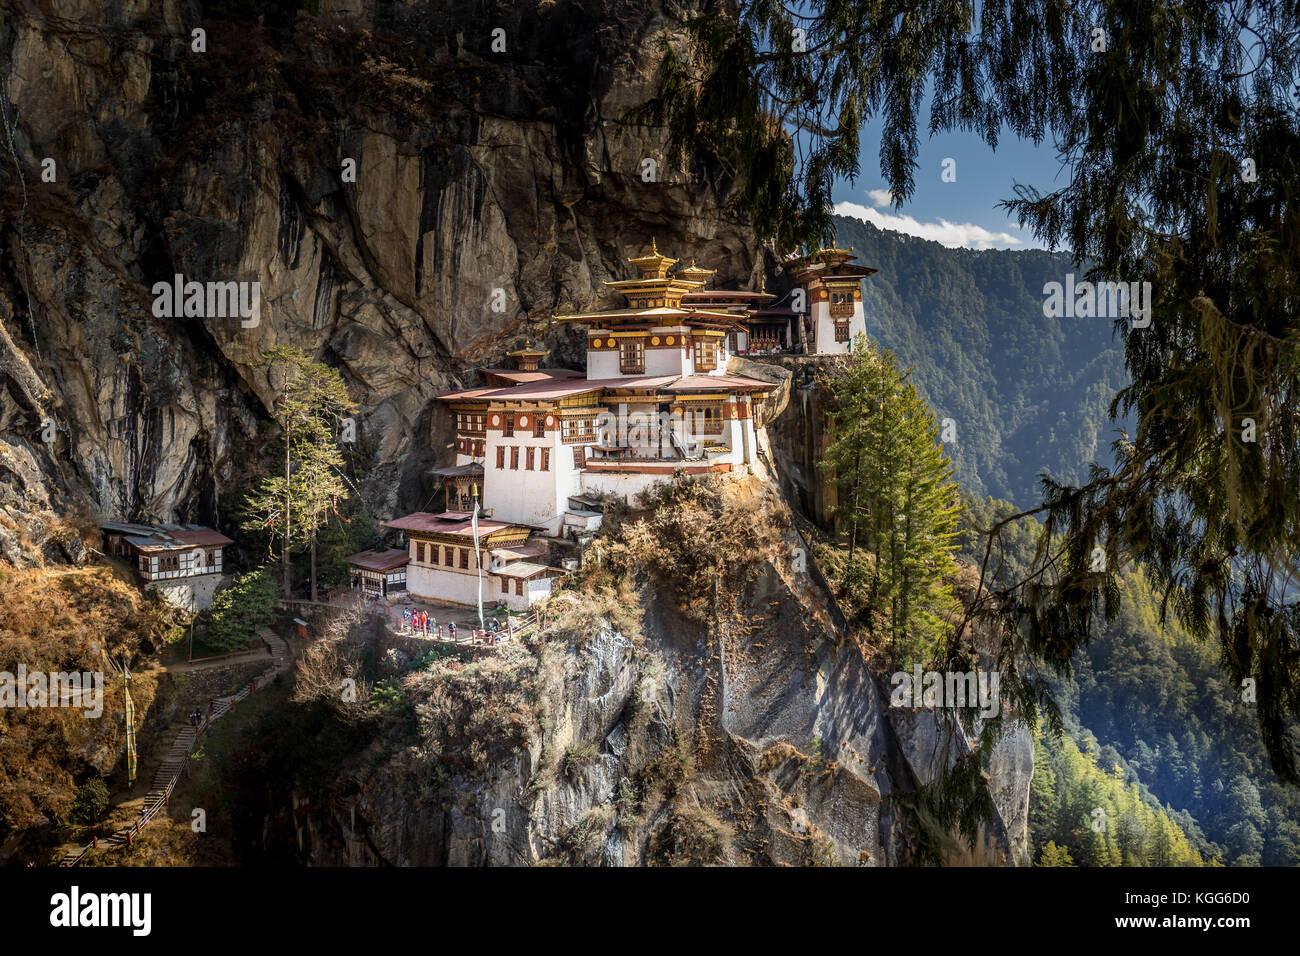 Famoso monasterio de Tiger's Nest cerca de Paro, Bhután Imagen De Stock